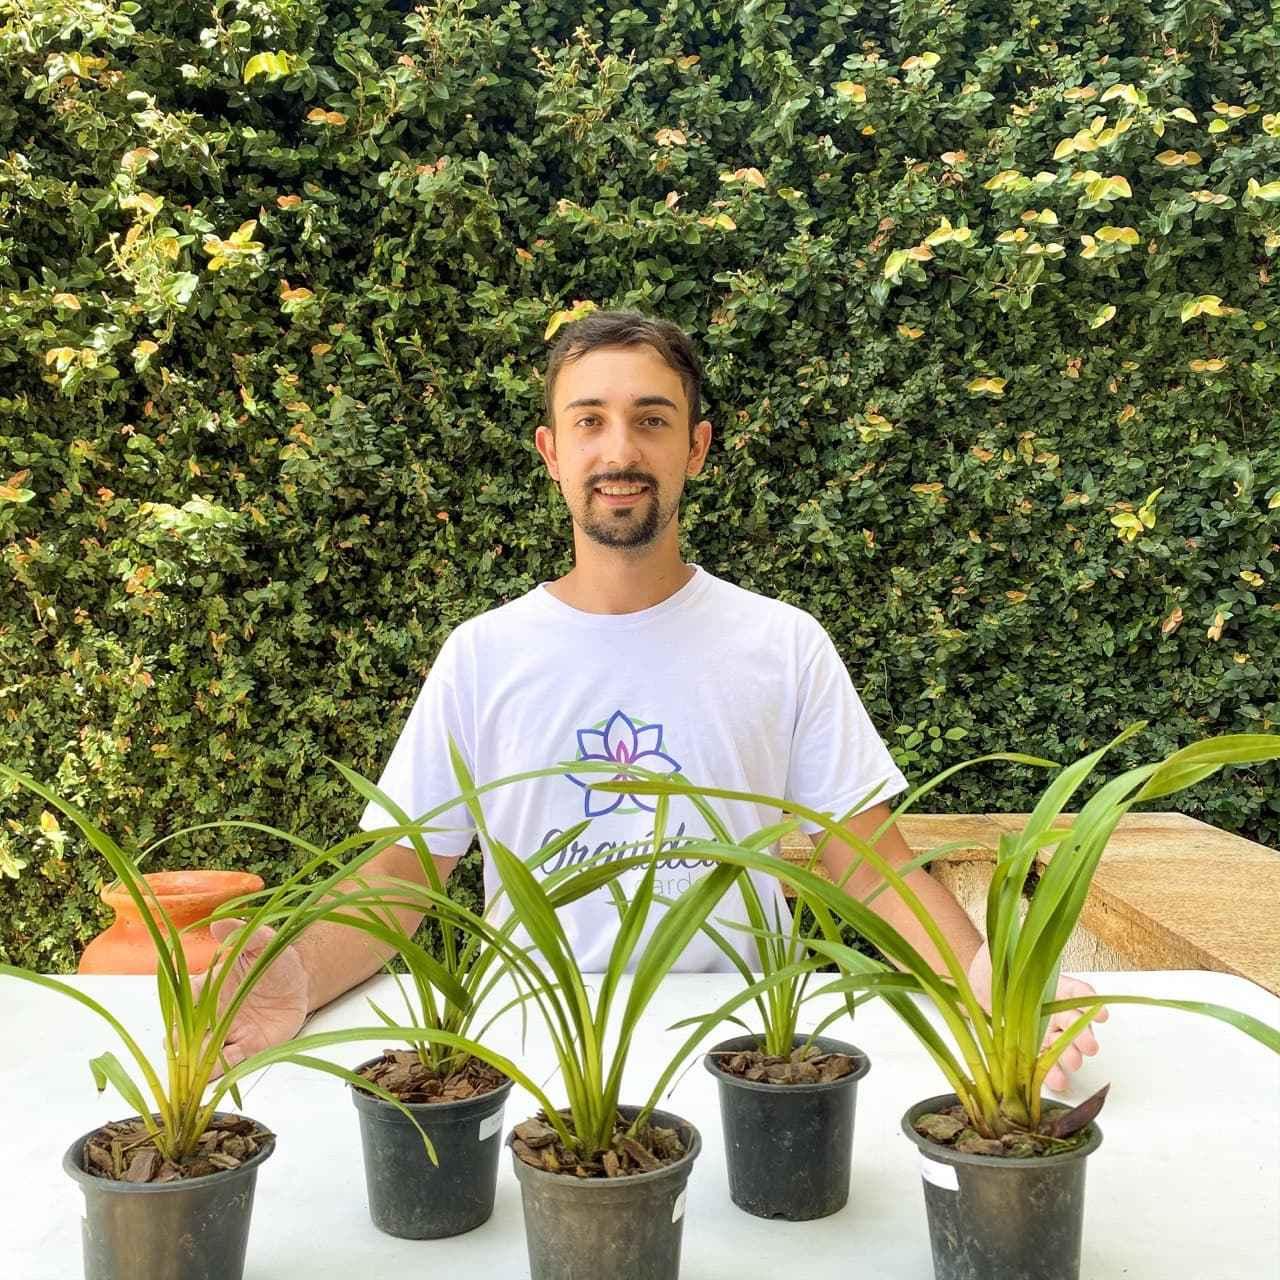 Kit 10 mudas Orquídea Cymbidium (JOVEM)  - ORQUIDEA GARDEN